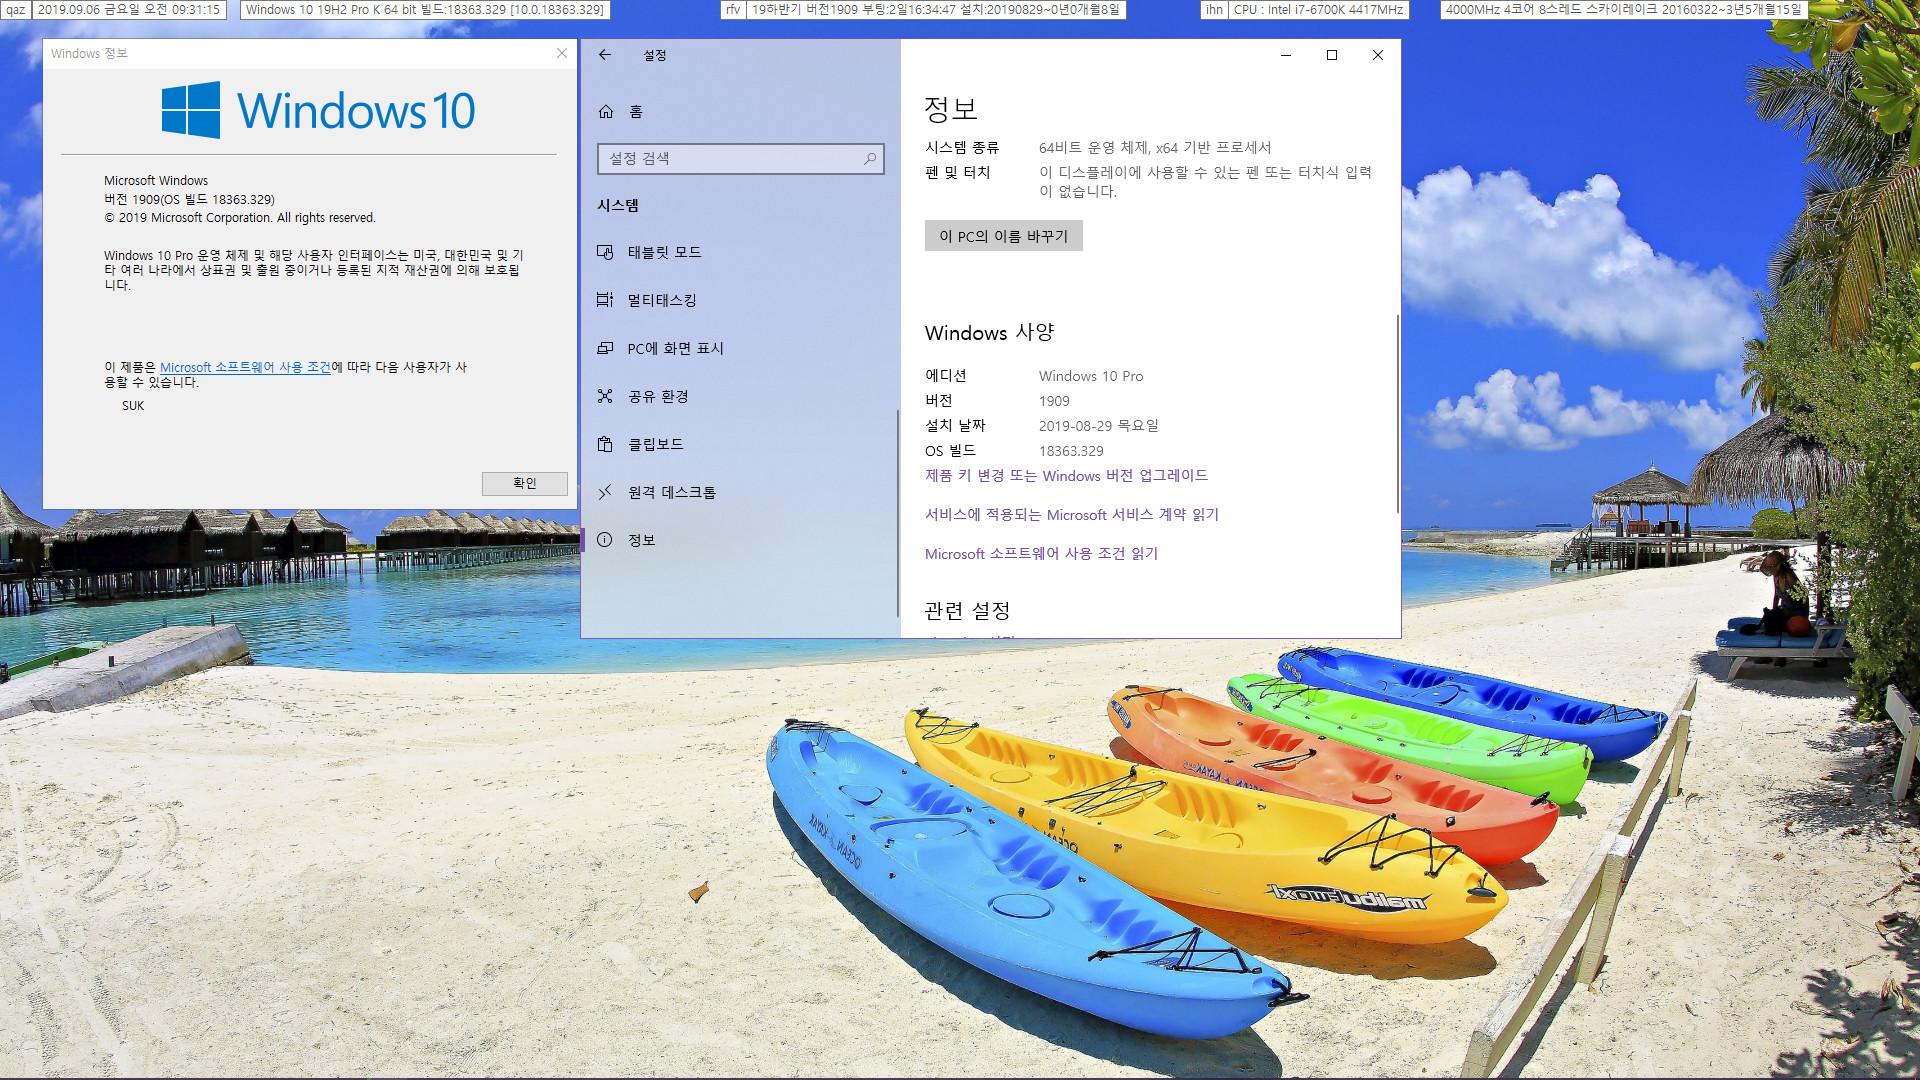 Windows 10 버전 1909 (OS 빌드 18363.329) [2019-08-29 일자] 릴리스 프리뷰 사용중 입니다 2019-09-06_093115.jpg